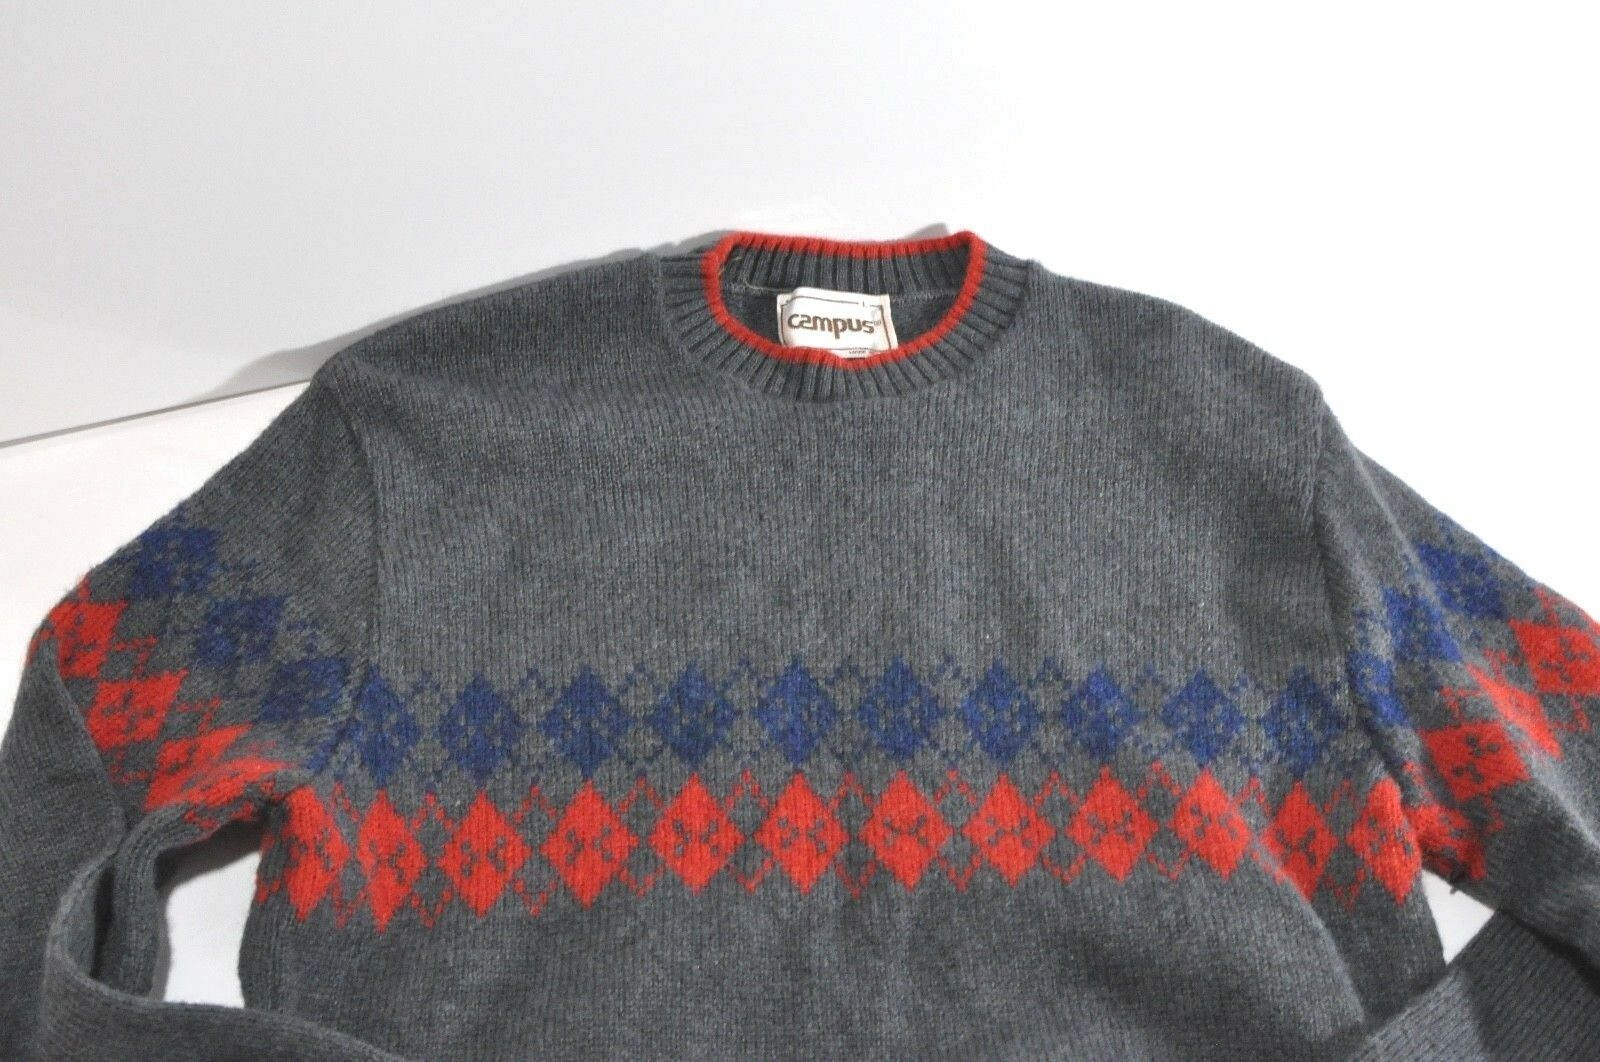 Vintage Campus wool sweater  Herren Large made in USA